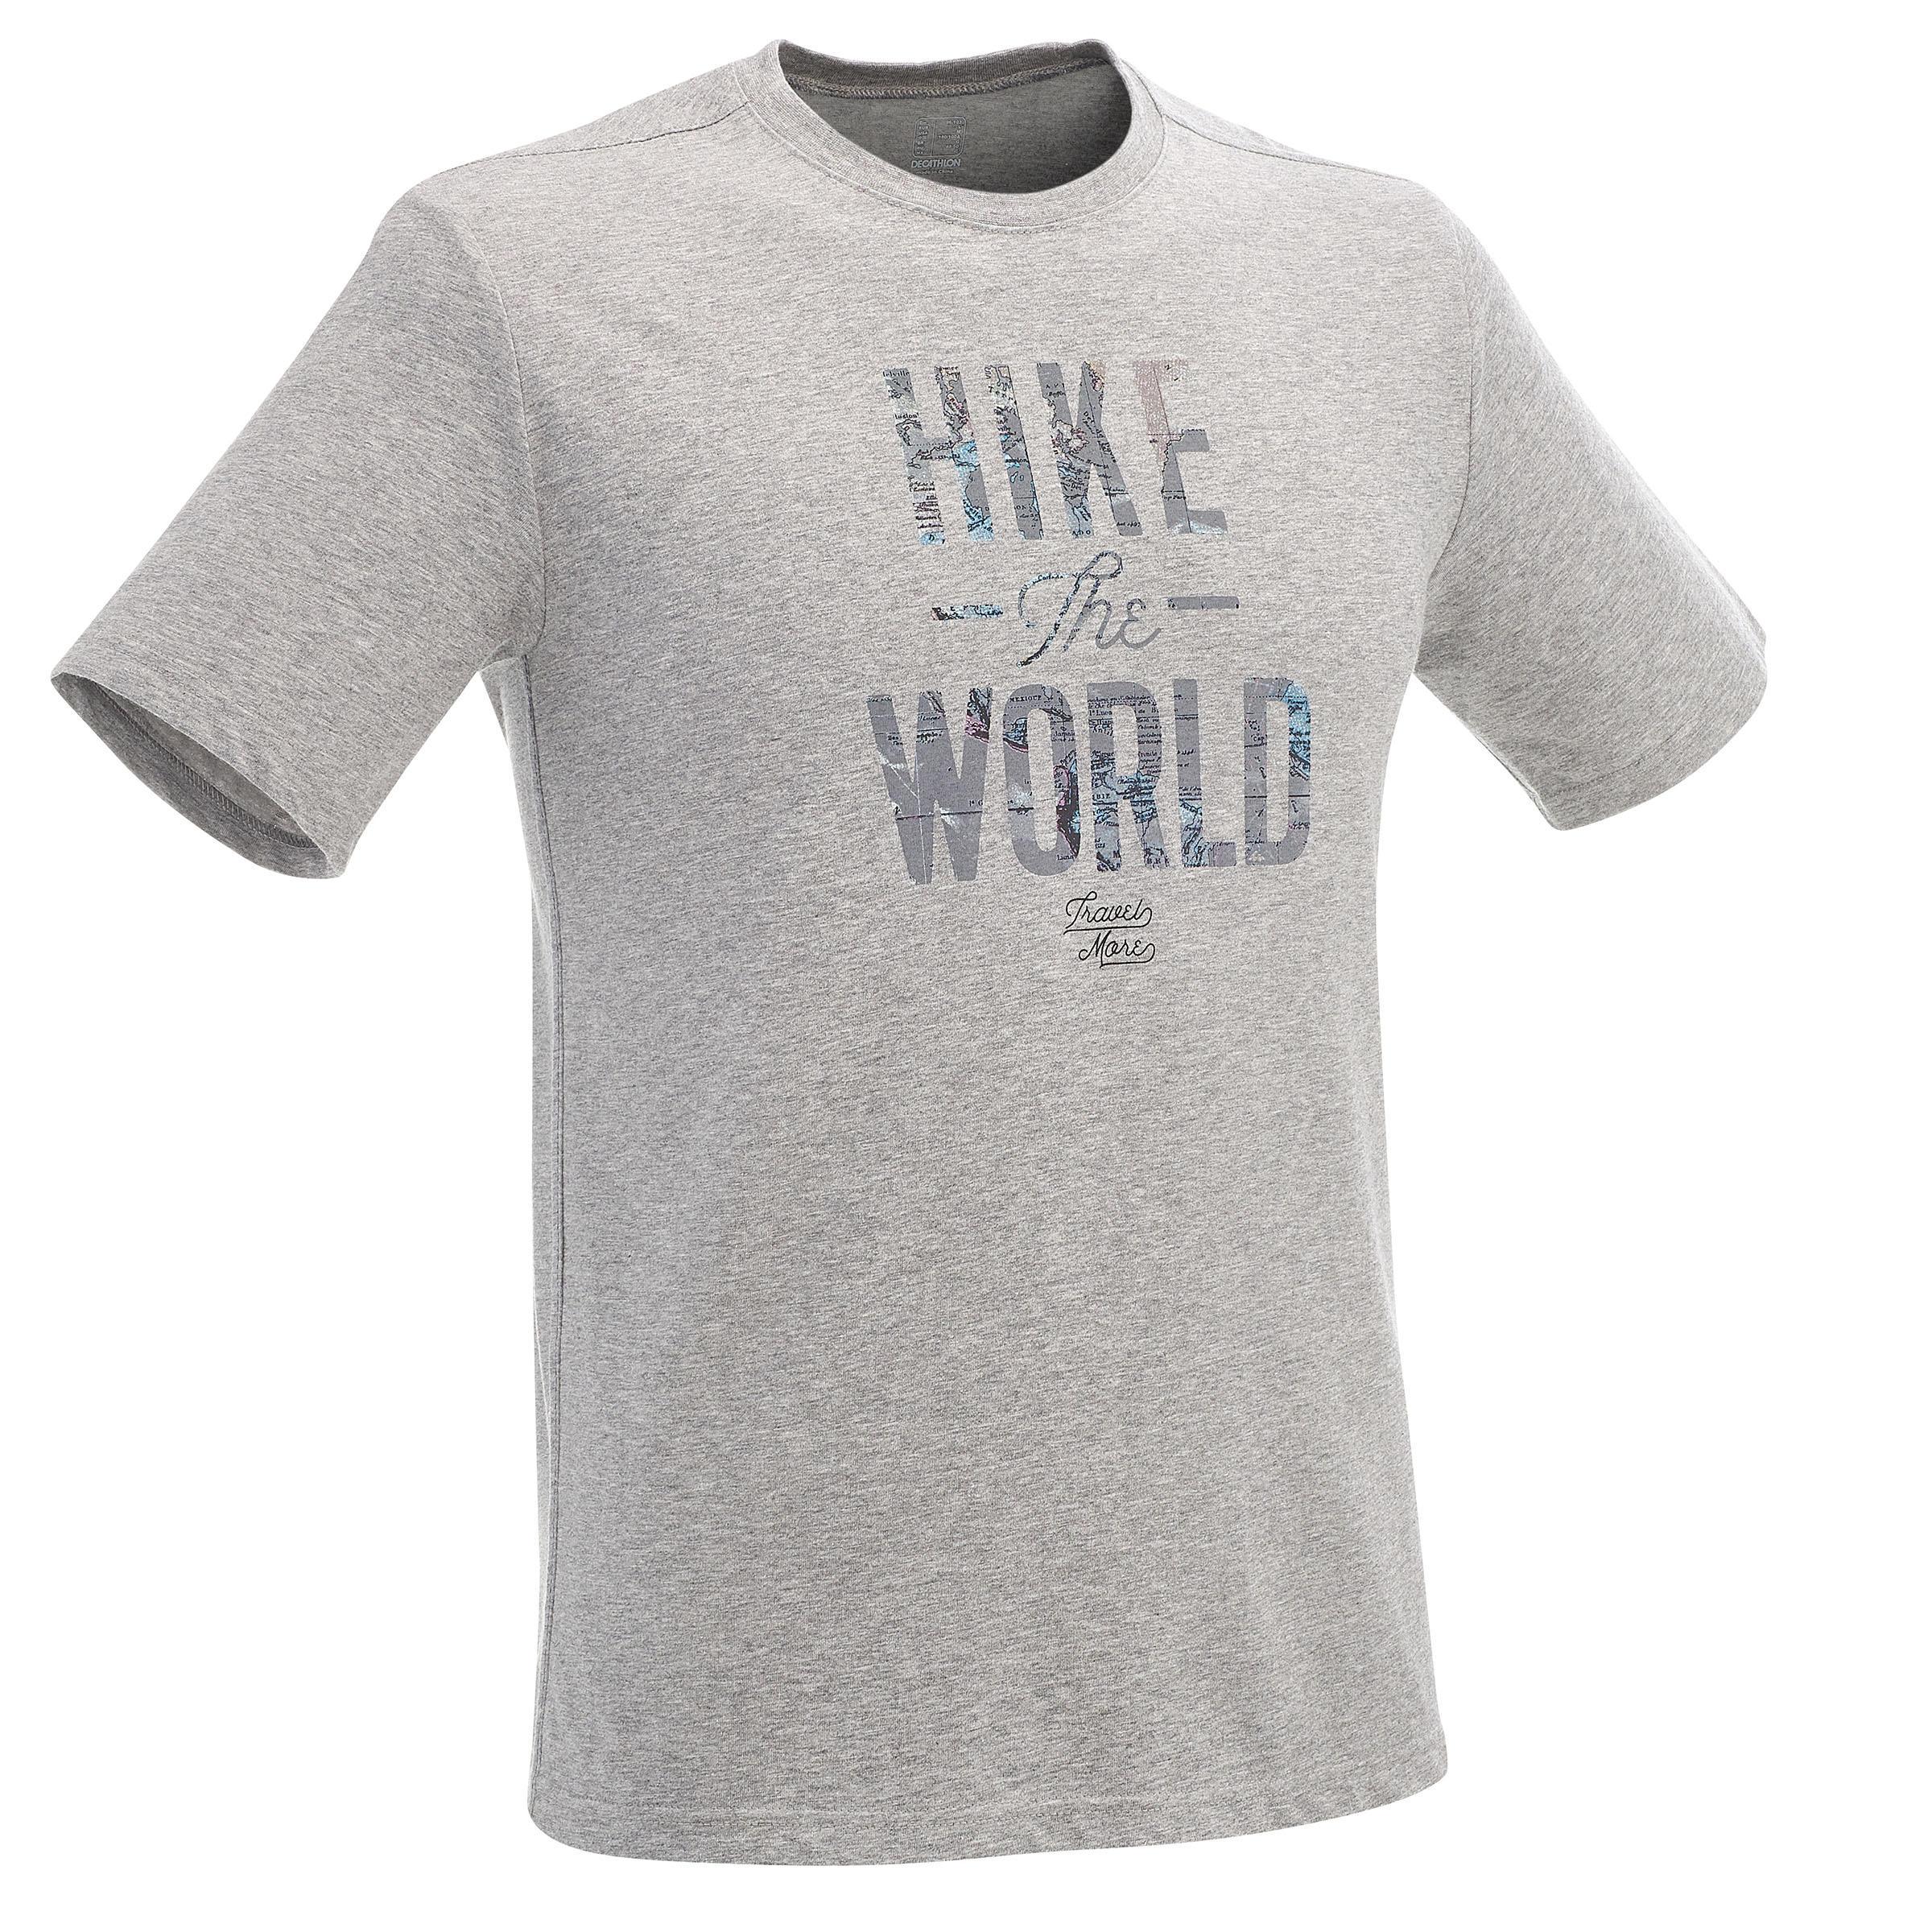 Camiseta manga corta travesía planicie hombre Tech TIL 100 gris jaspeado